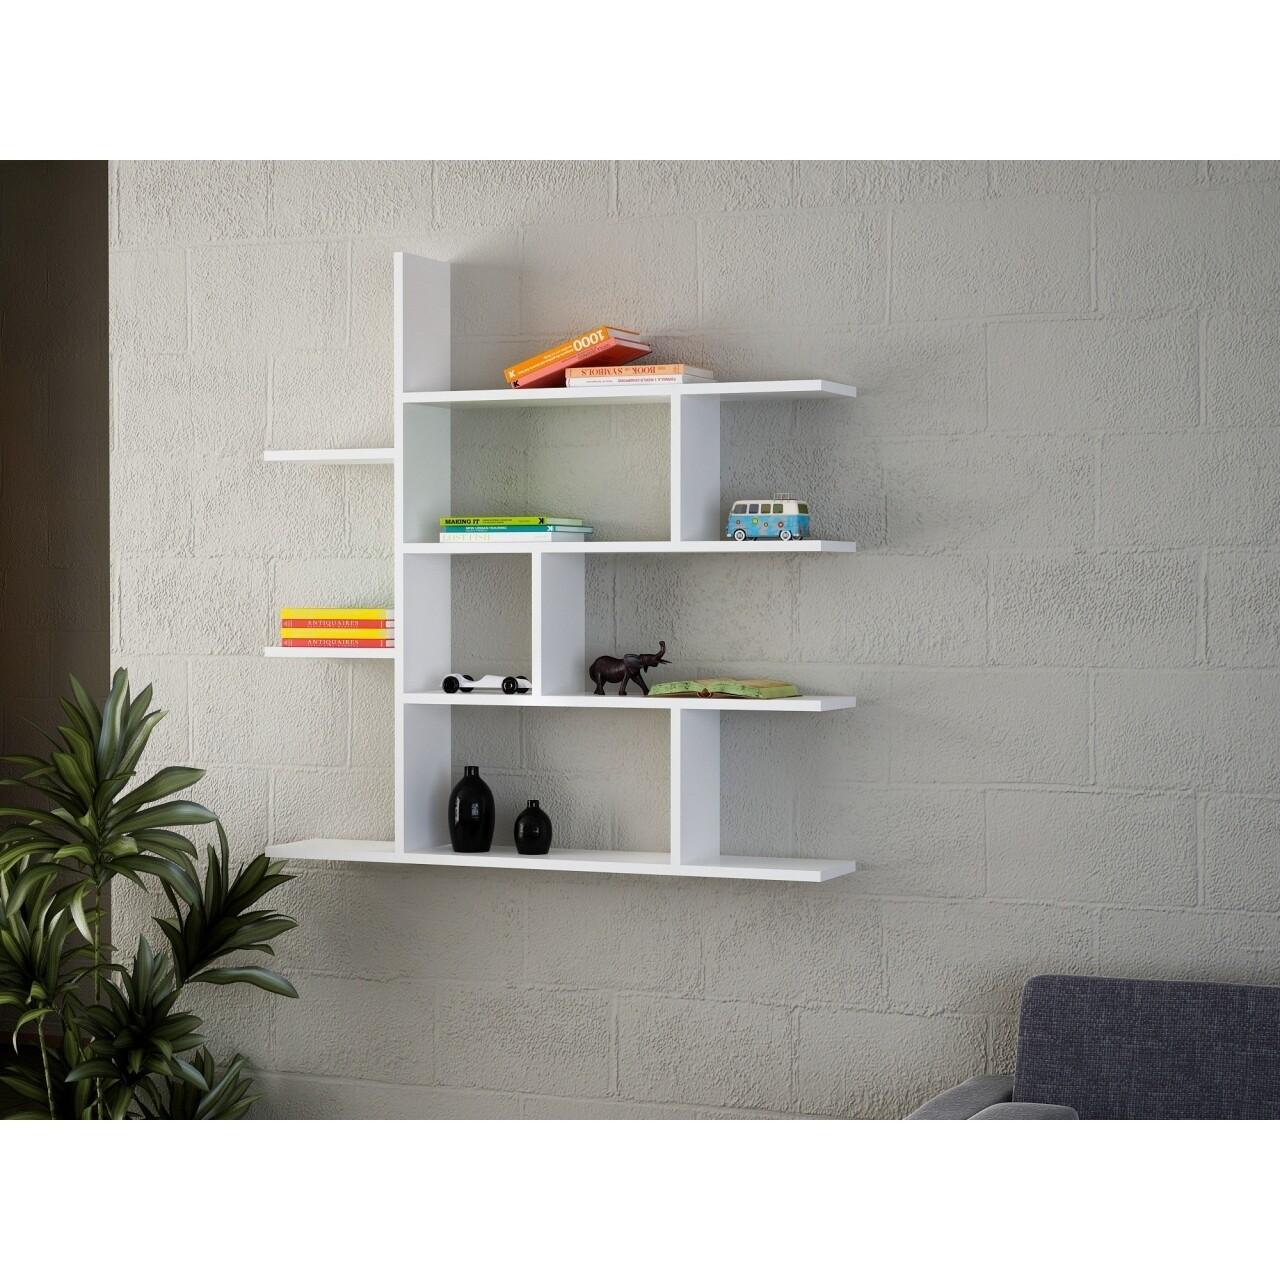 Raft pentru perete, Wooden Art, White, 120x121.8x22 cm